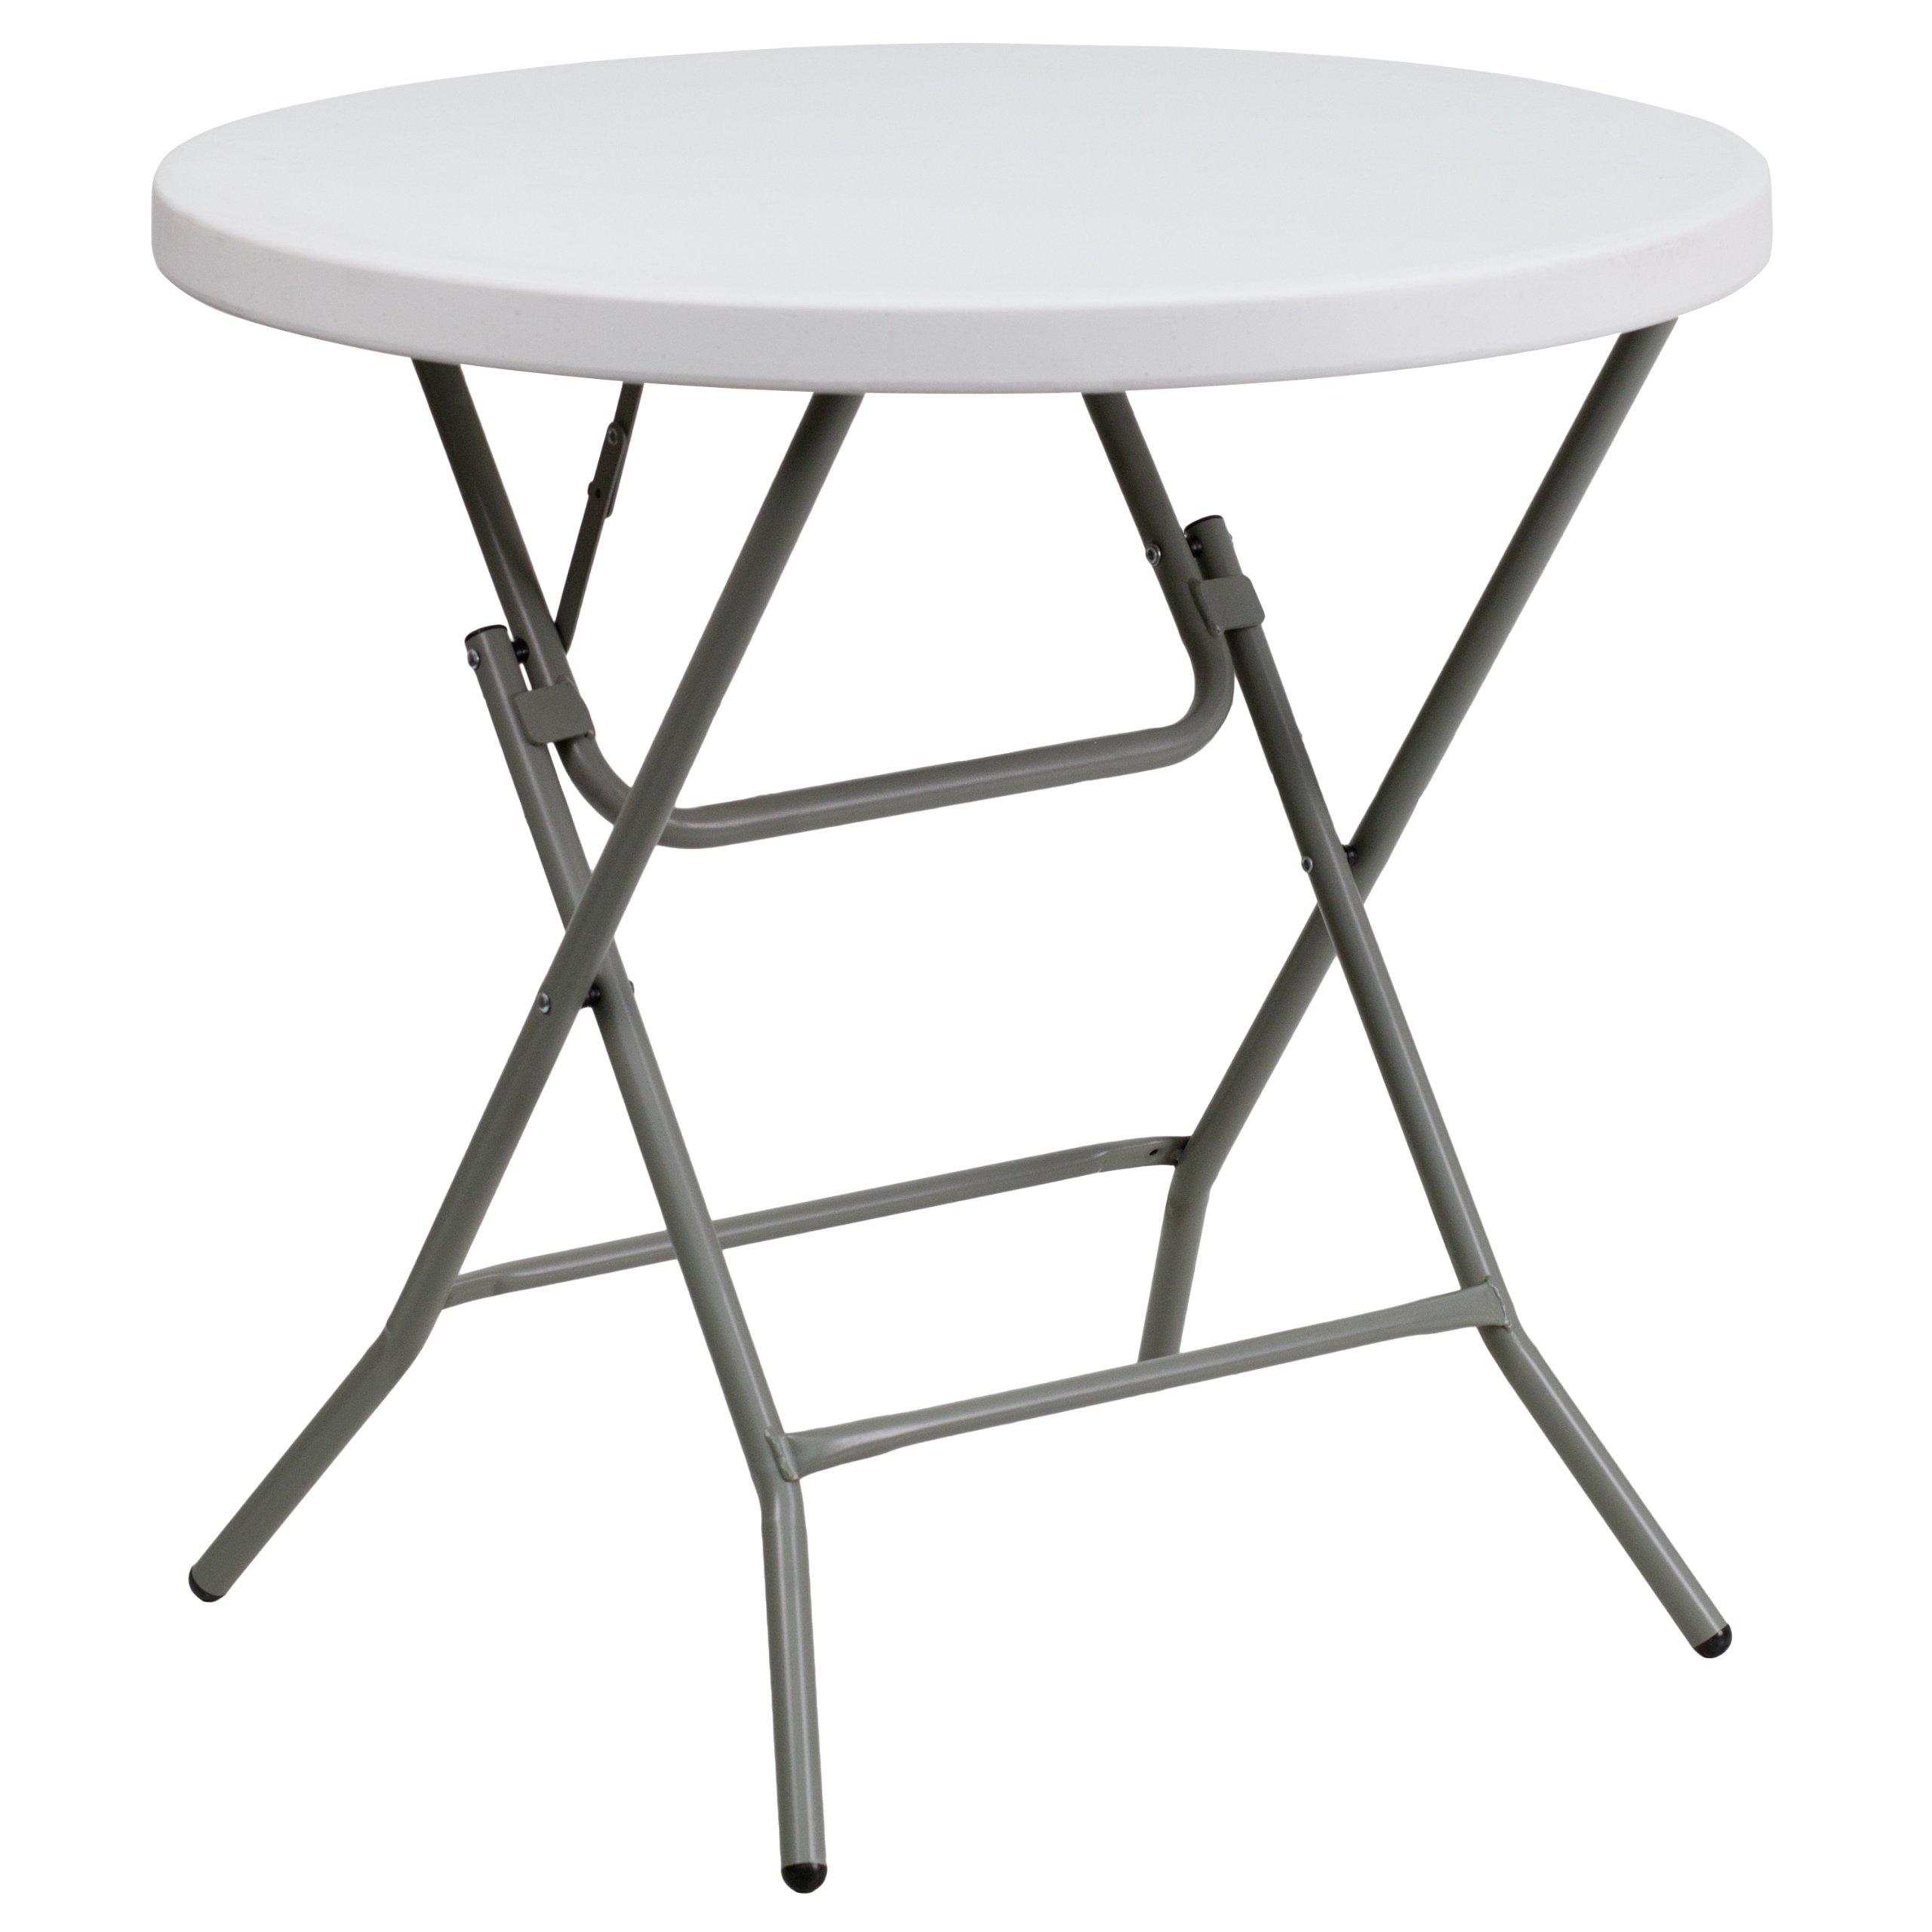 Flash Furniture Granite 32-Inch Round Folding Table, White by Flash Furniture